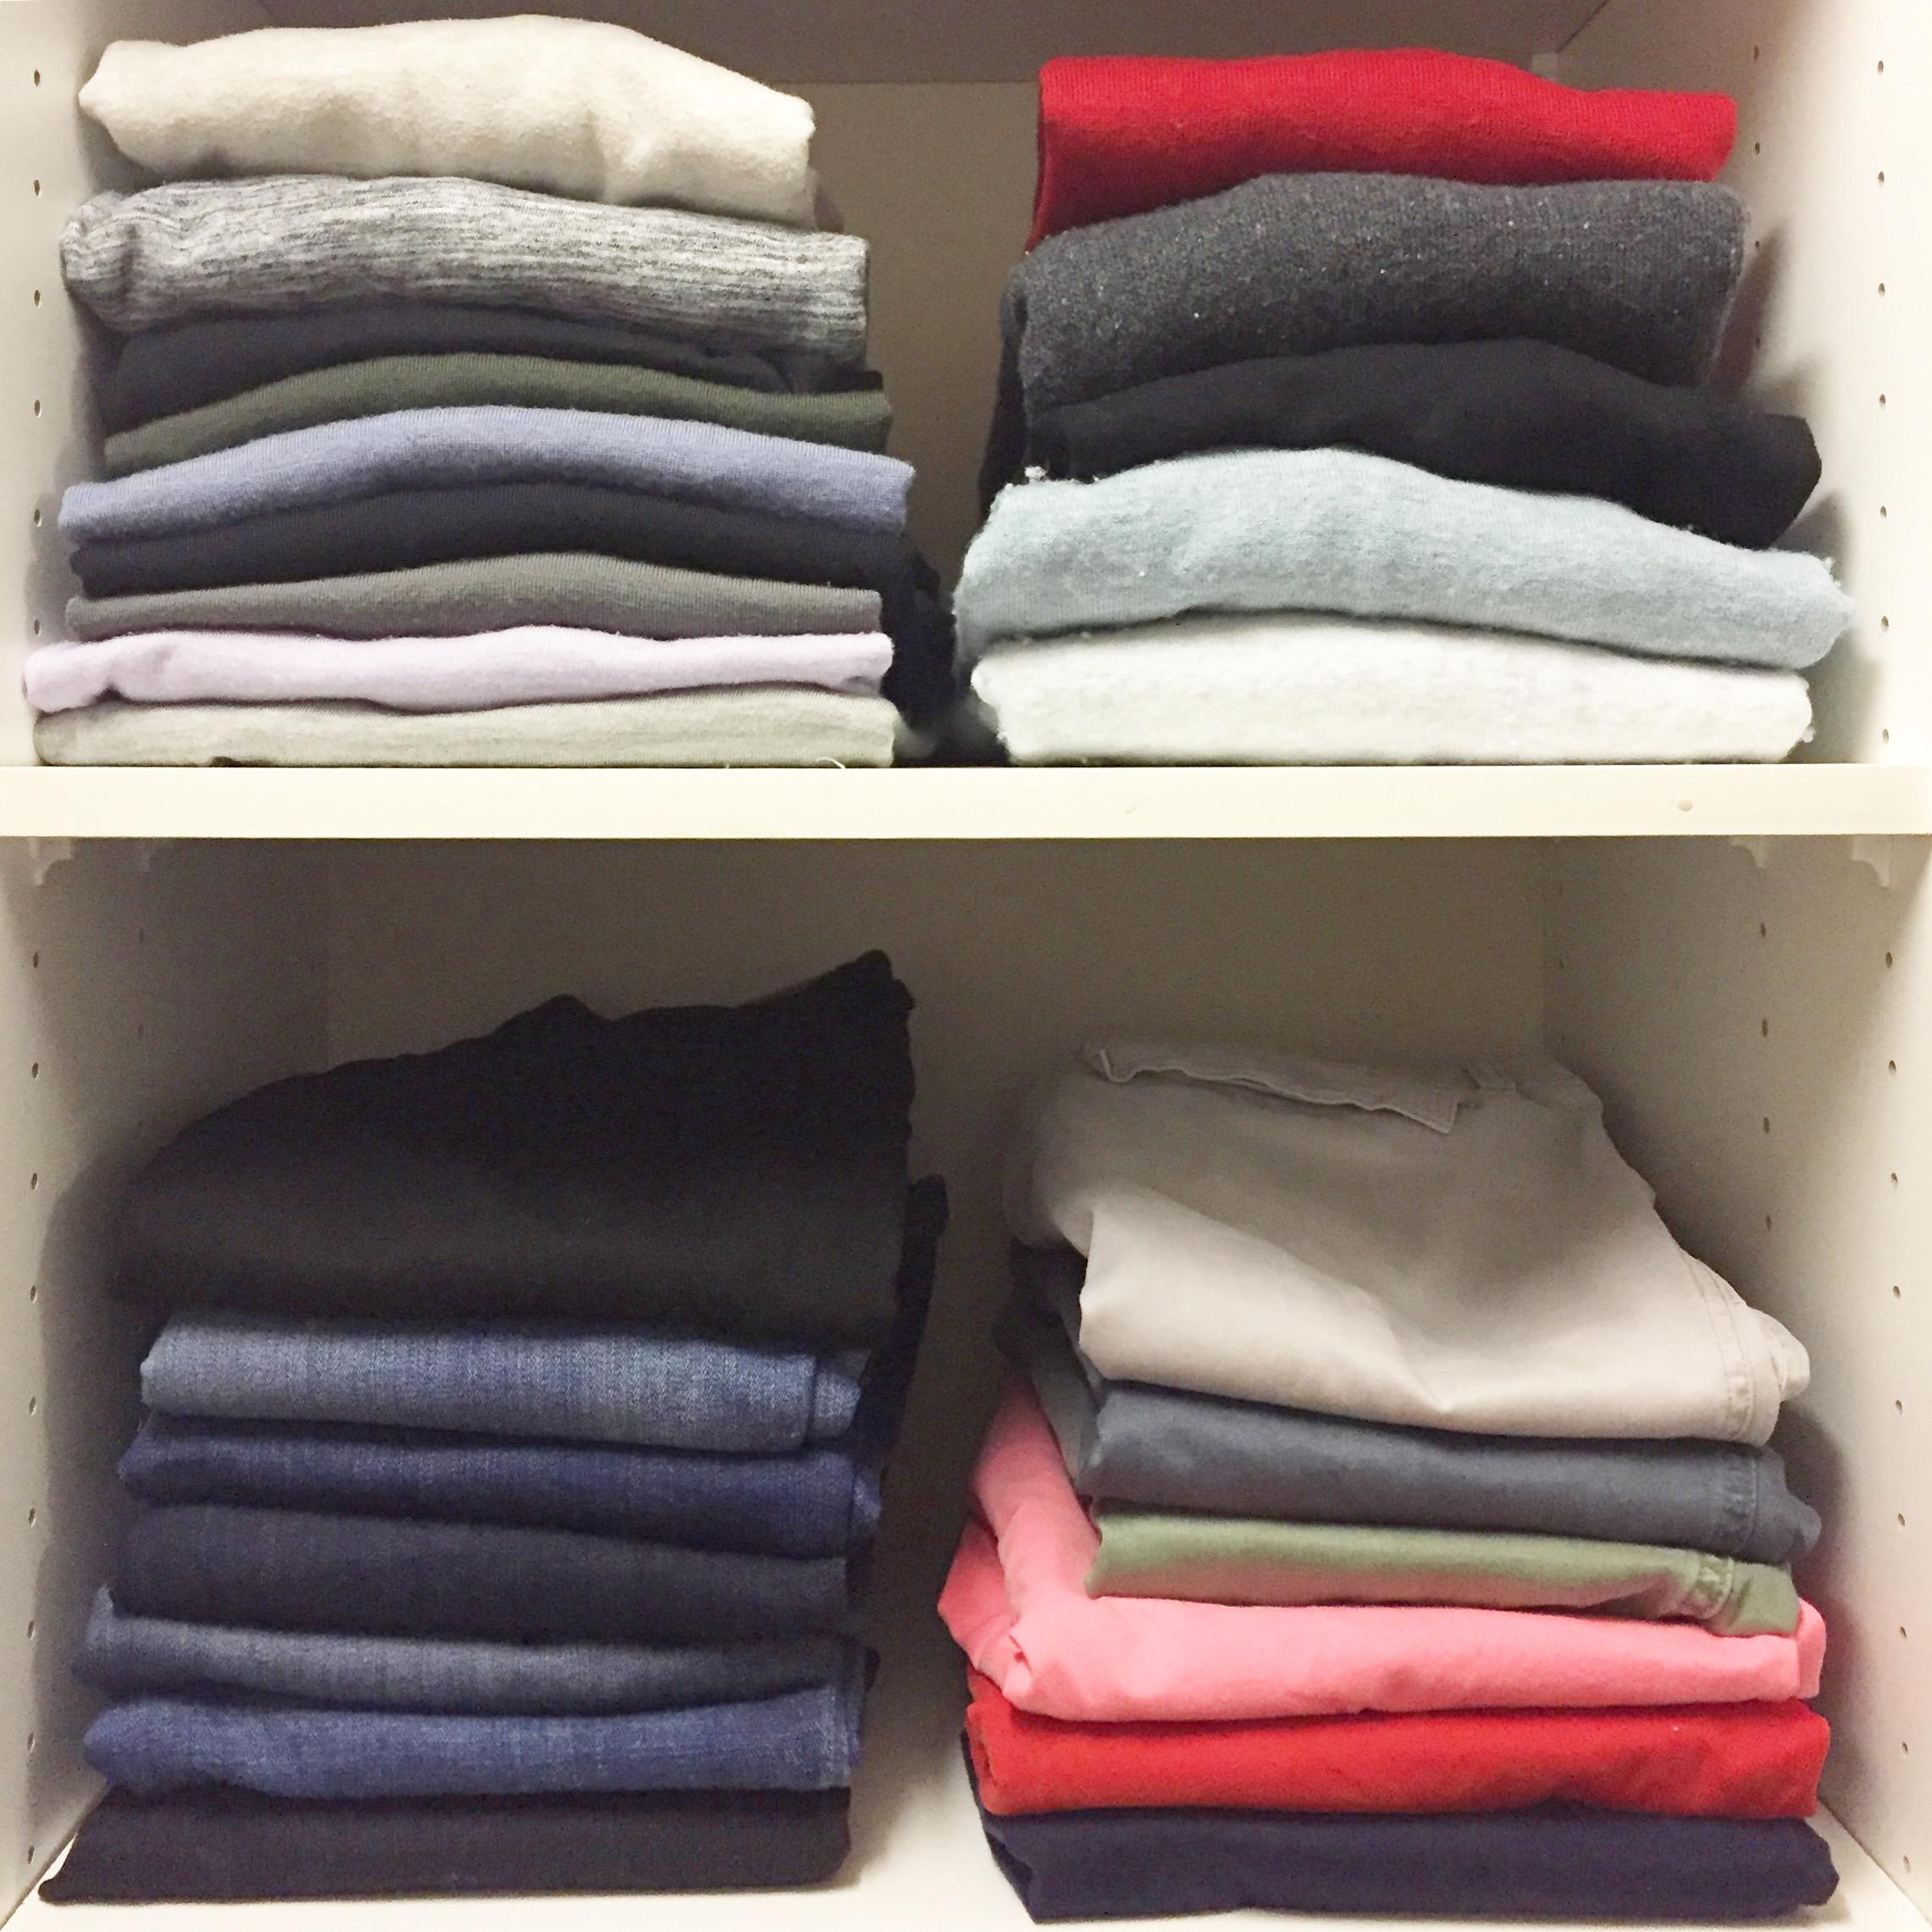 Henry & Higby_Folded Clothing Organization.JPG